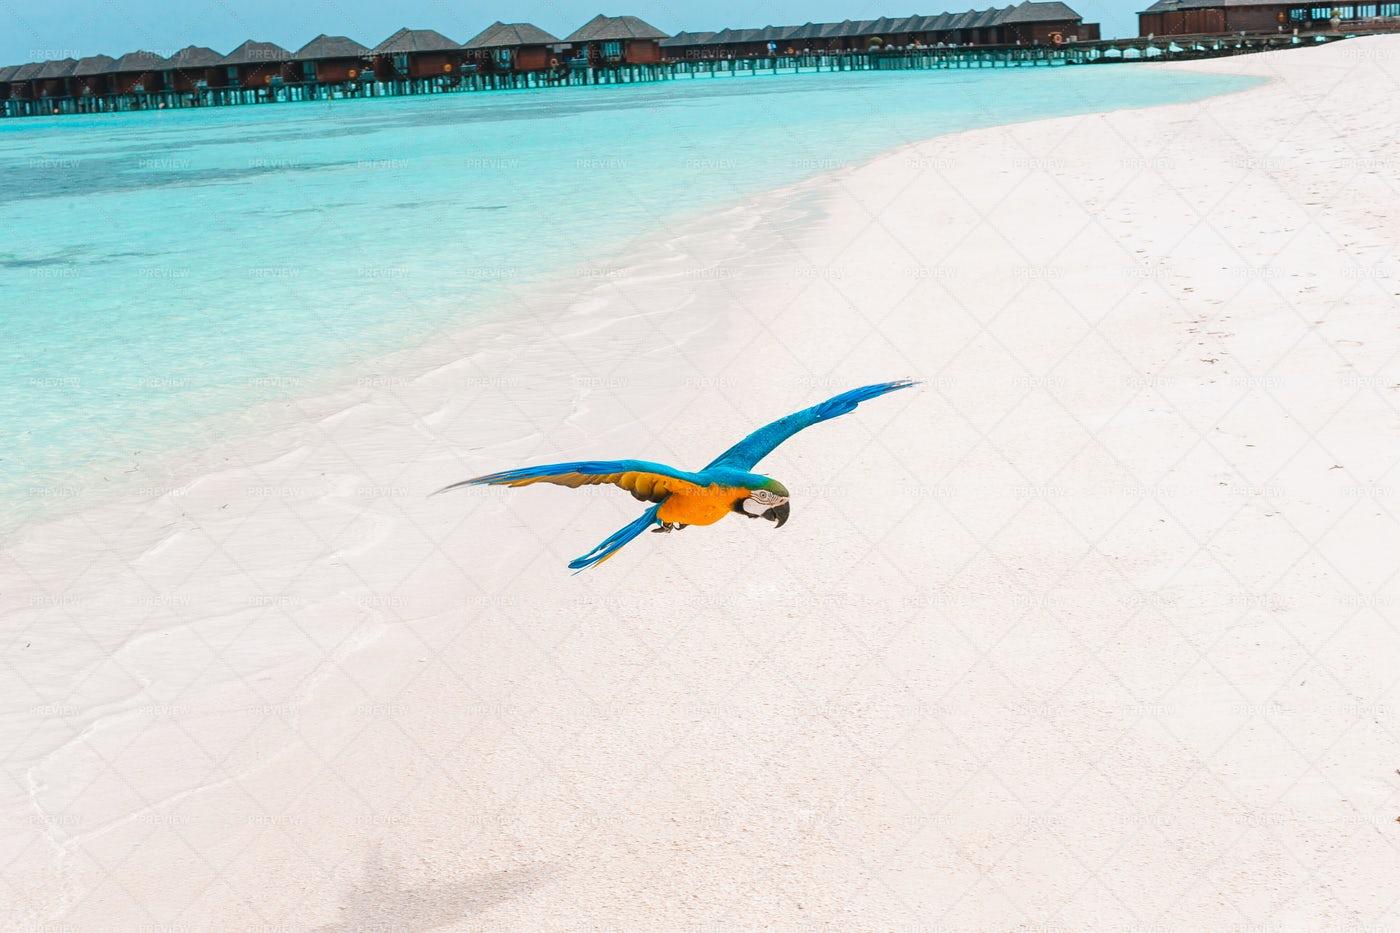 Parrot Flying Above Tropical Beach: Stock Photos